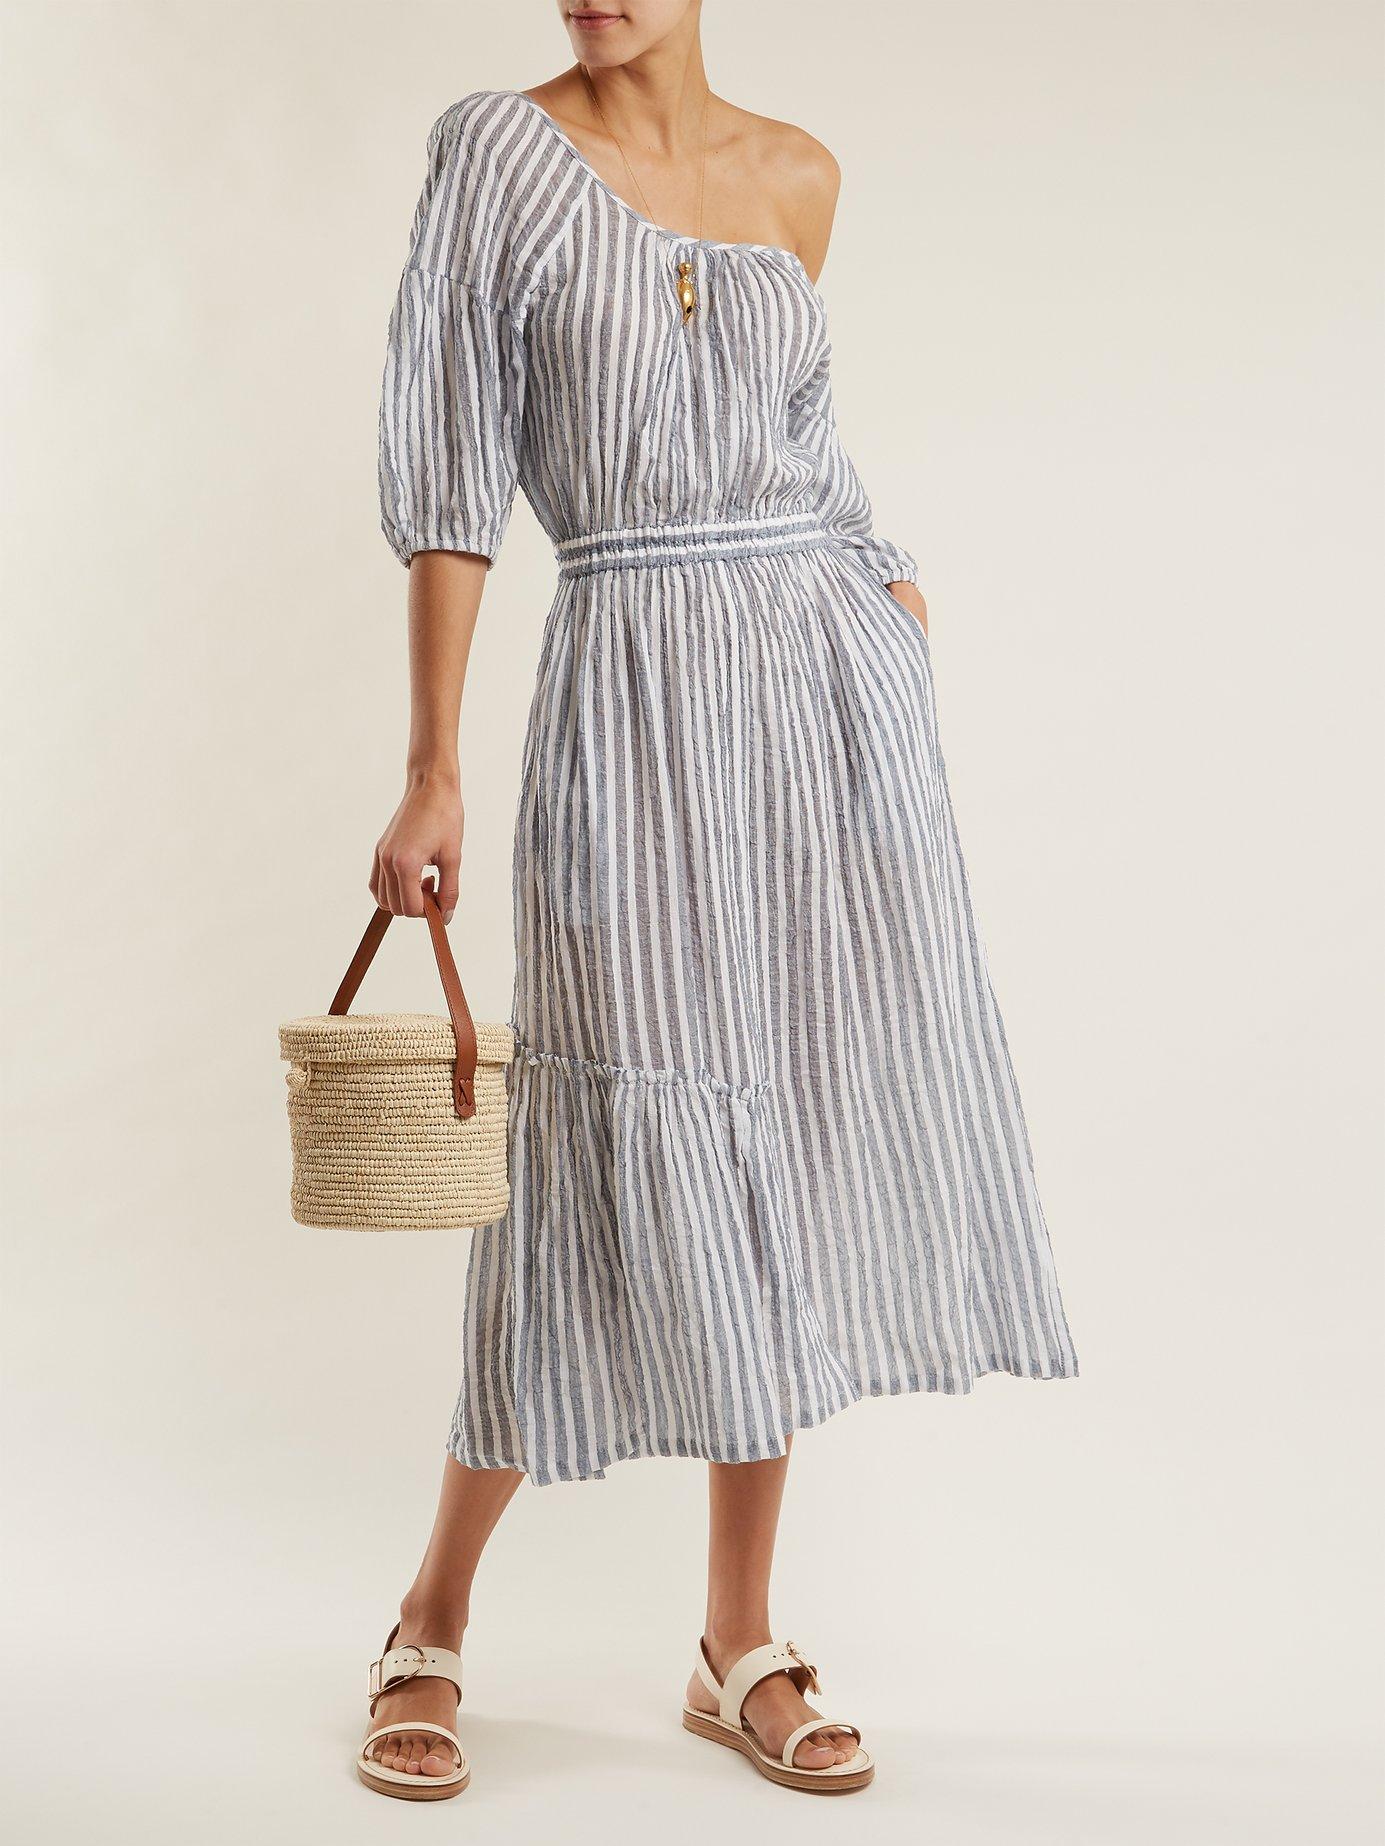 Camellia one-shoulder striped-cotton dress by Apiece Apart